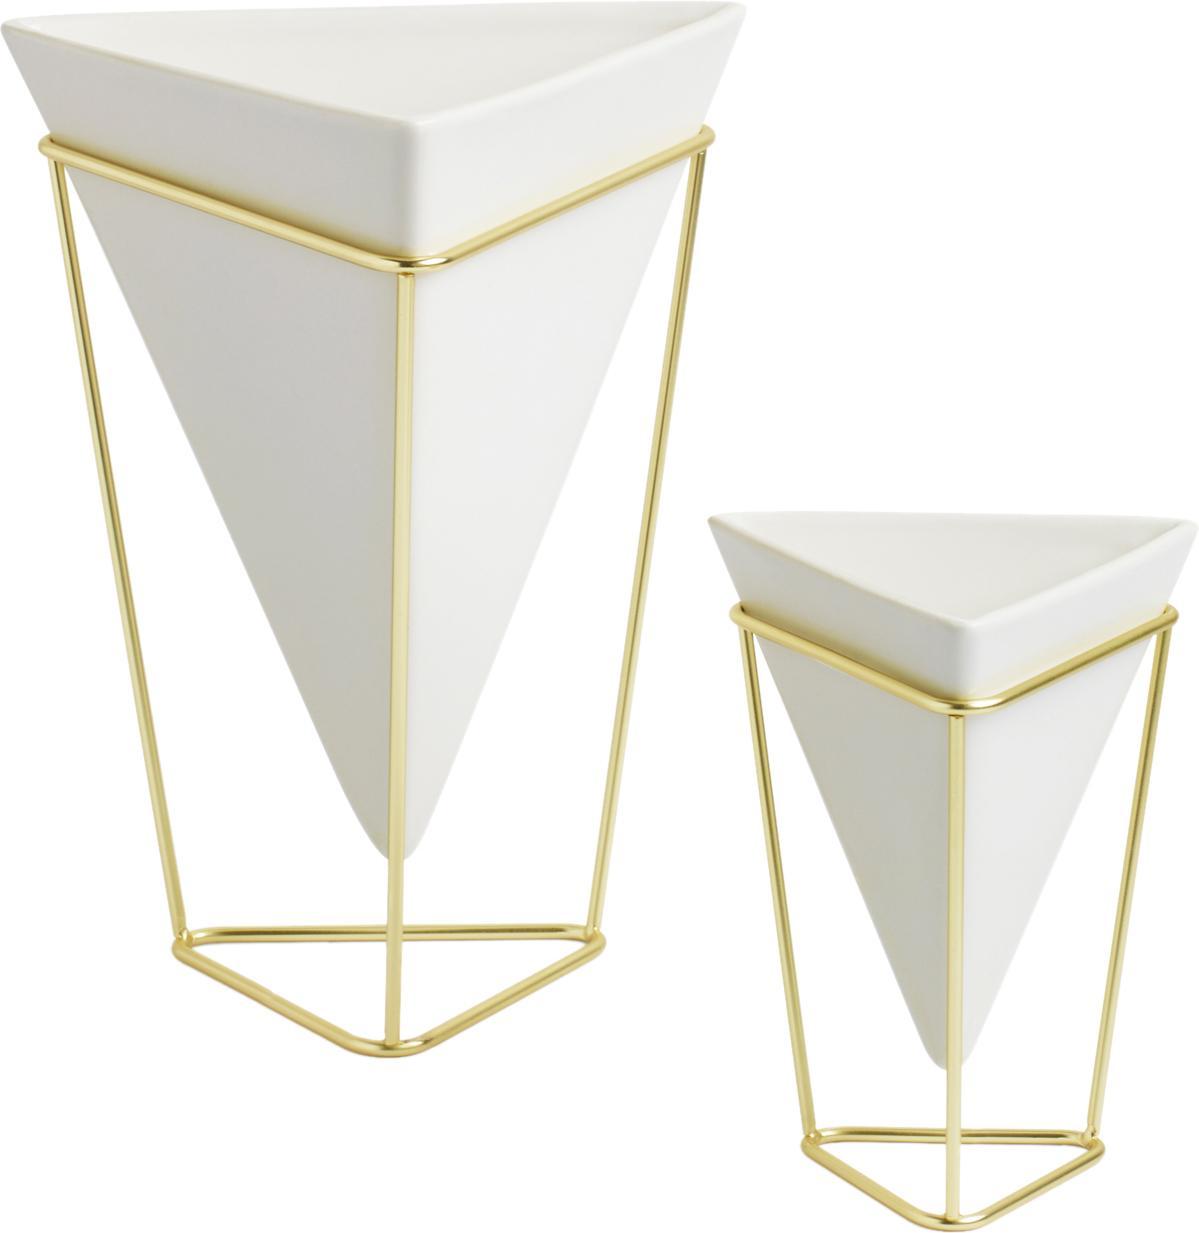 Vasen-Set Trigg, 2-tlg., Vasenhalter: Metall, vermessingt, Aufbewahrung: Weiss<br>Aufhängung: Messing, Verschiedene Grössen